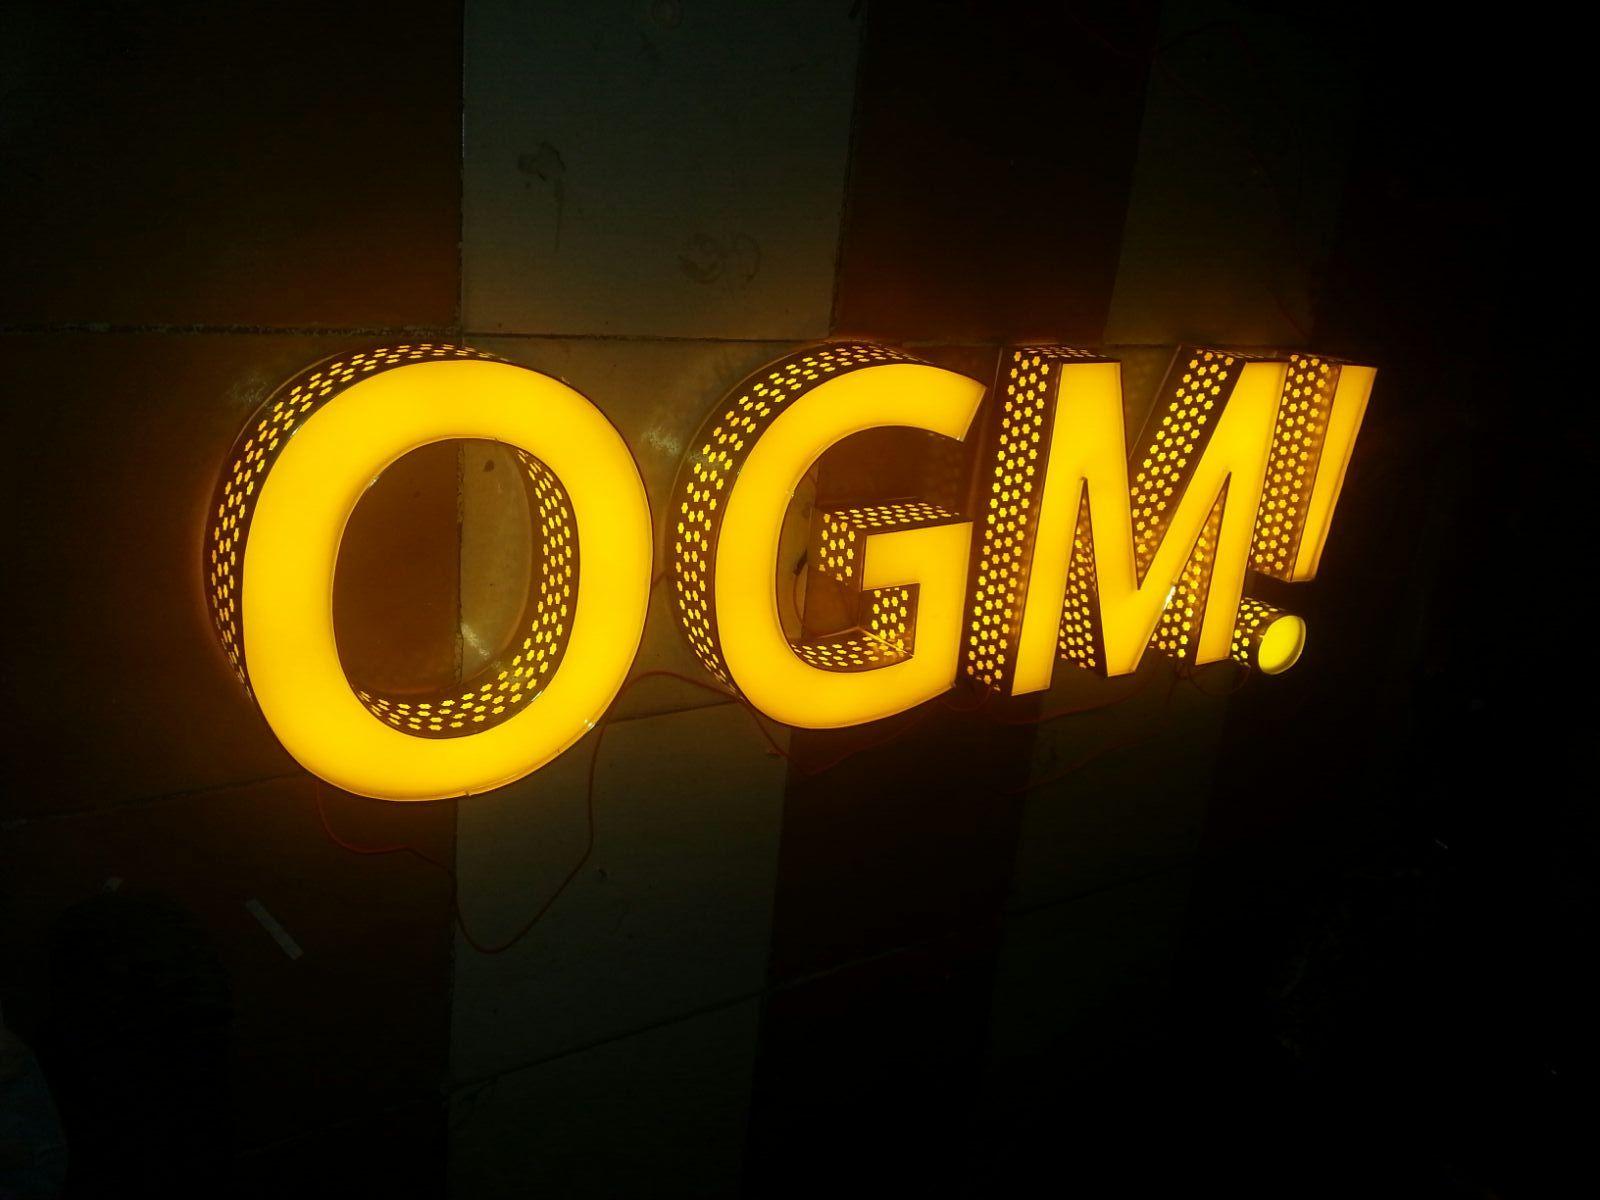 Galaxy Signage: 3D LED Signage Sign Board Logo Designing/Manufacturing Company Delhi NCR India|Digital Flex Vinyl Printing Shop Gurgaon Ghaziabad Noida